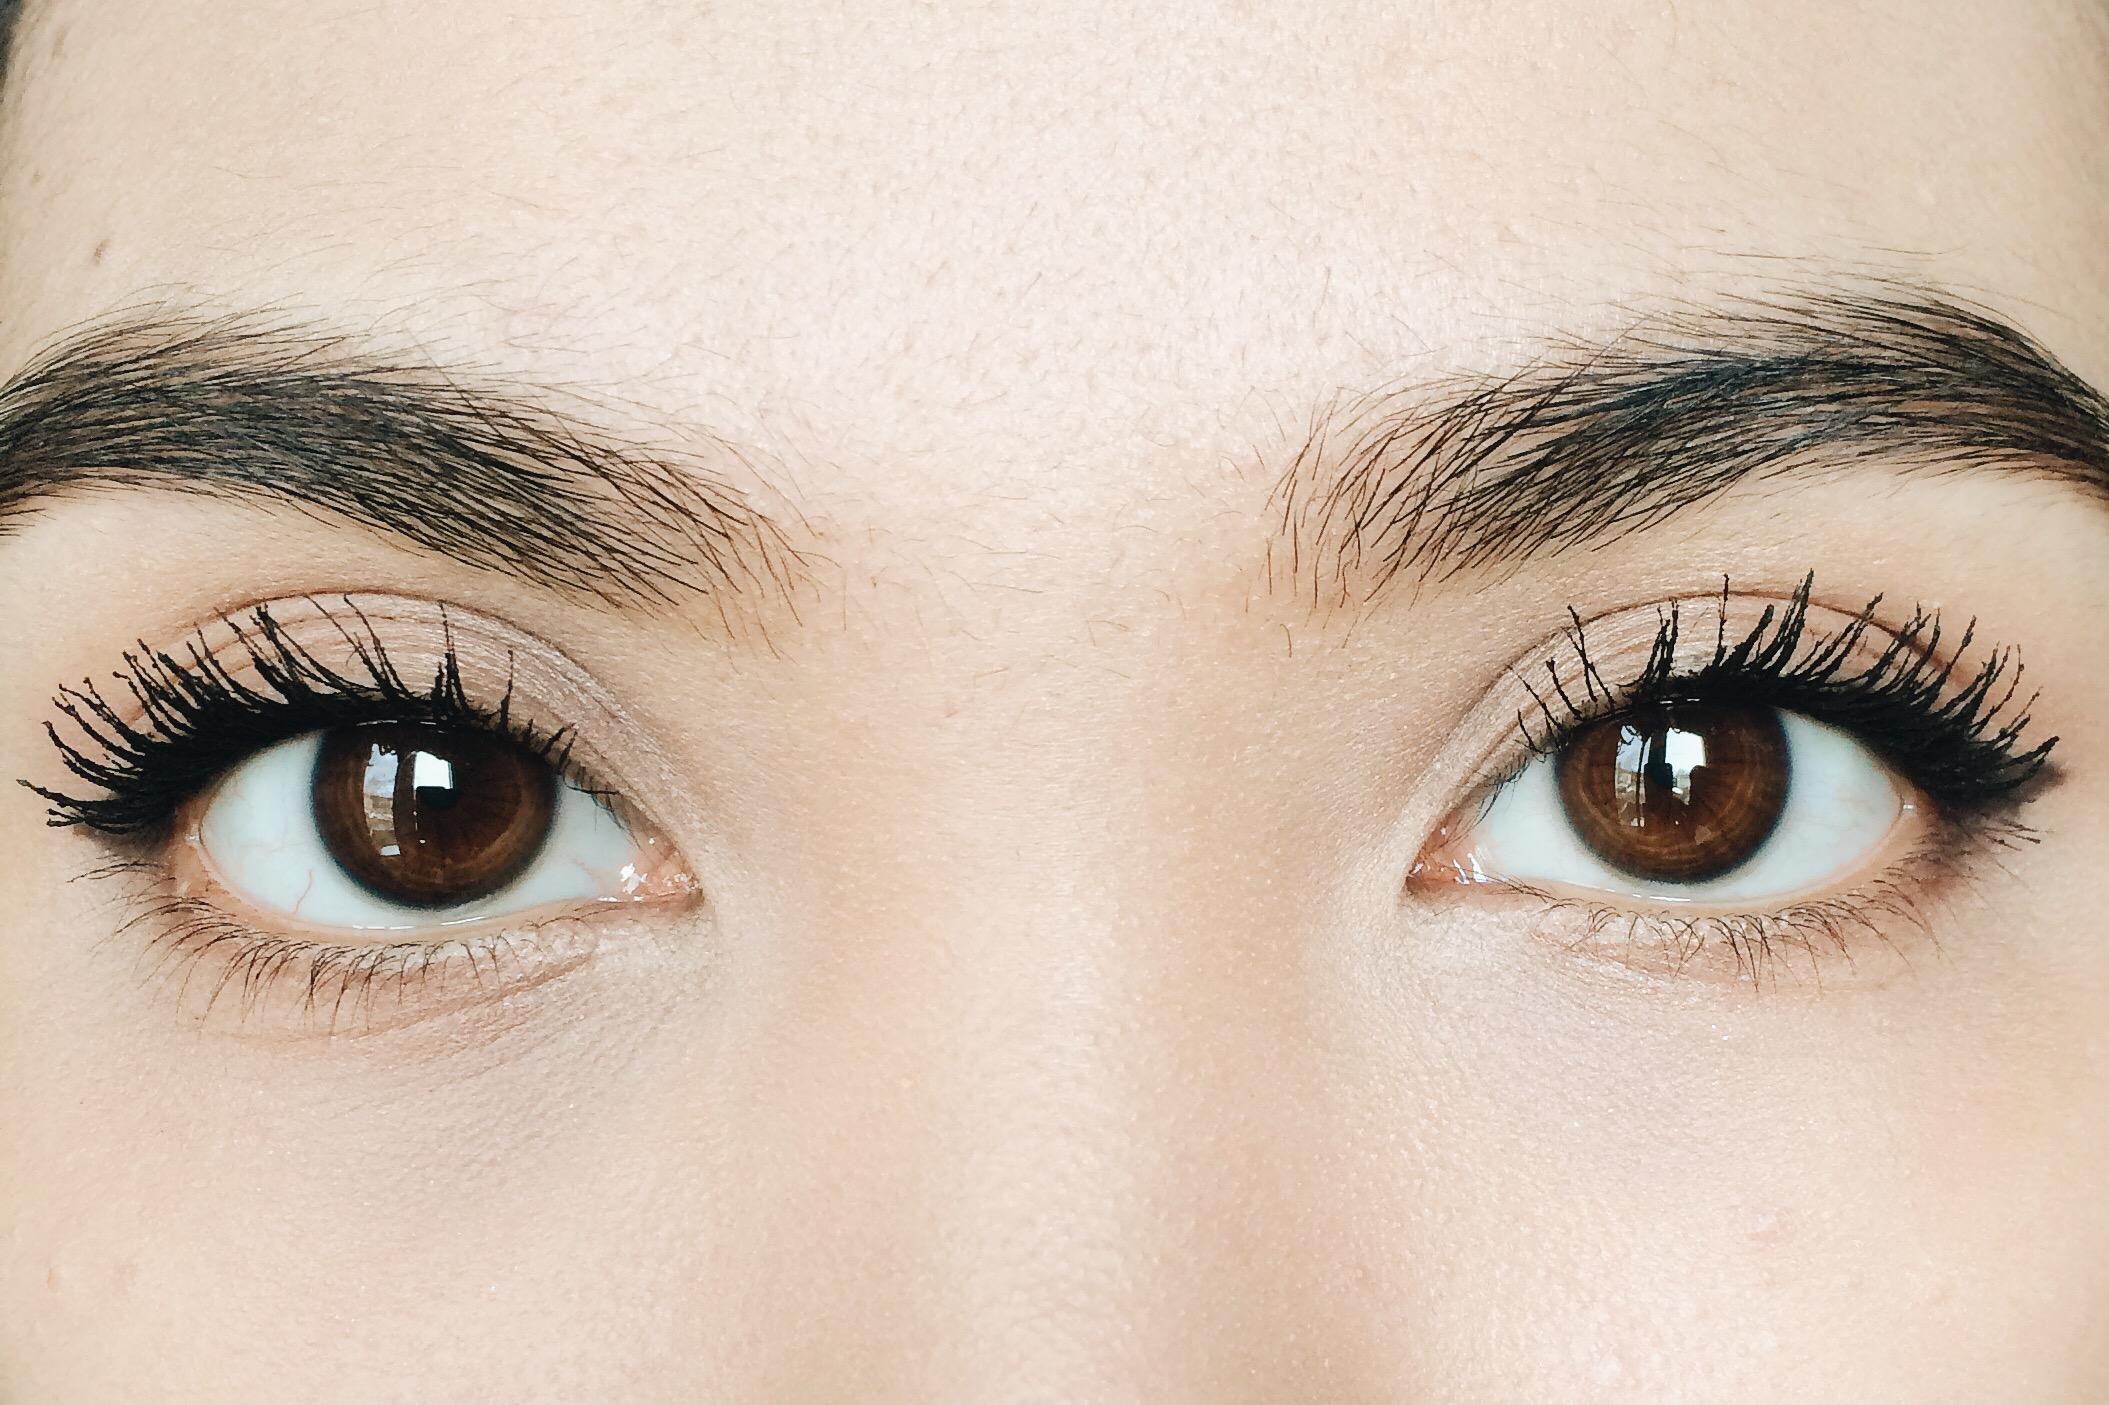 both eyes coated with both waterproof and voluminous macsaras